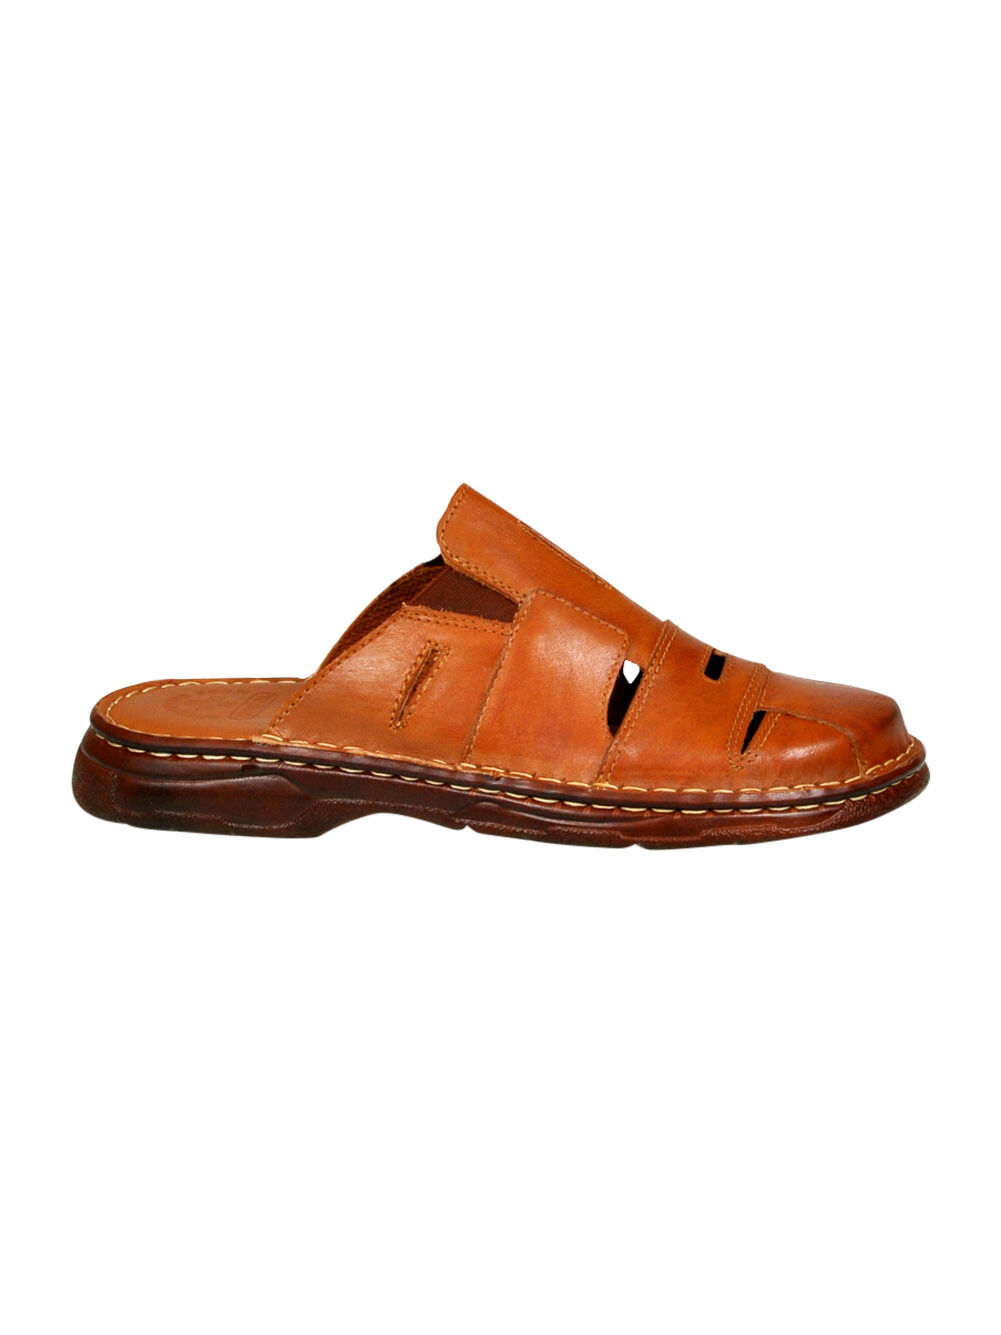 Men Comfy Orthopedic Natural Buffalo Leather Sandals Shoes UK Size 7 8 9 10 11